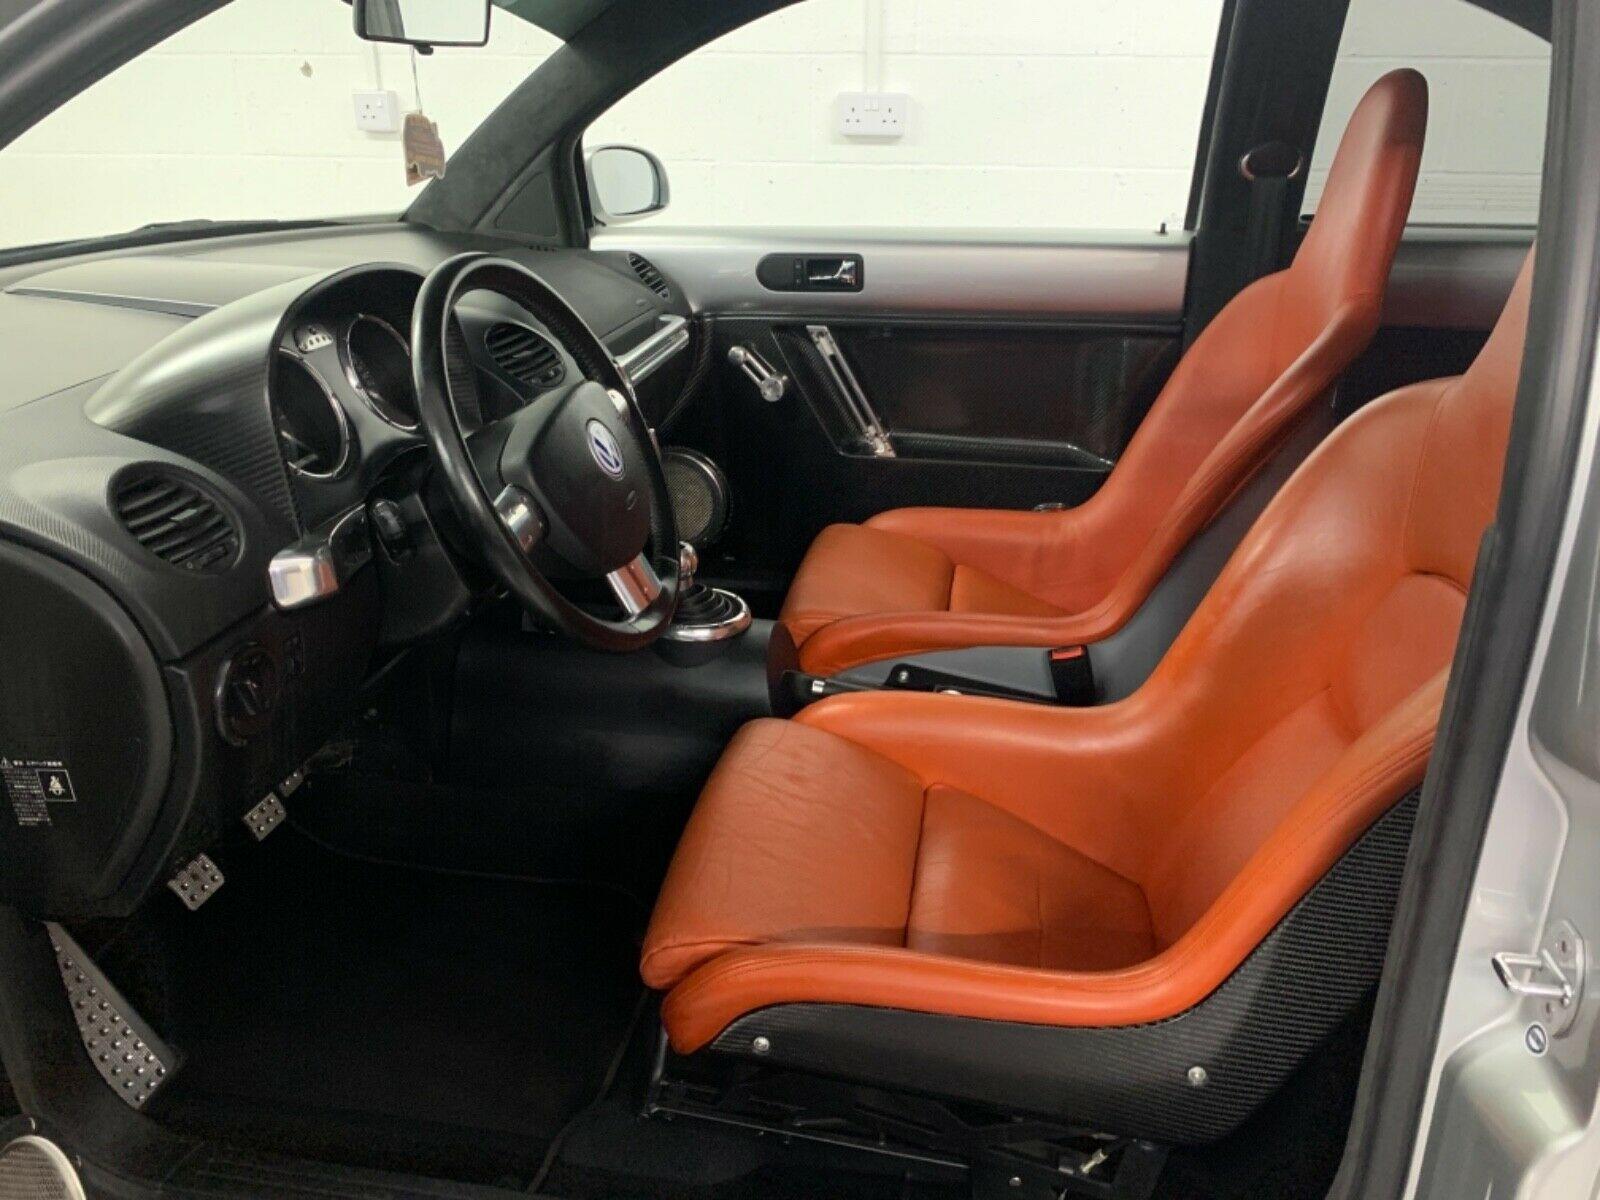 Volkswagen-Beetle-RSi-for-sale-8